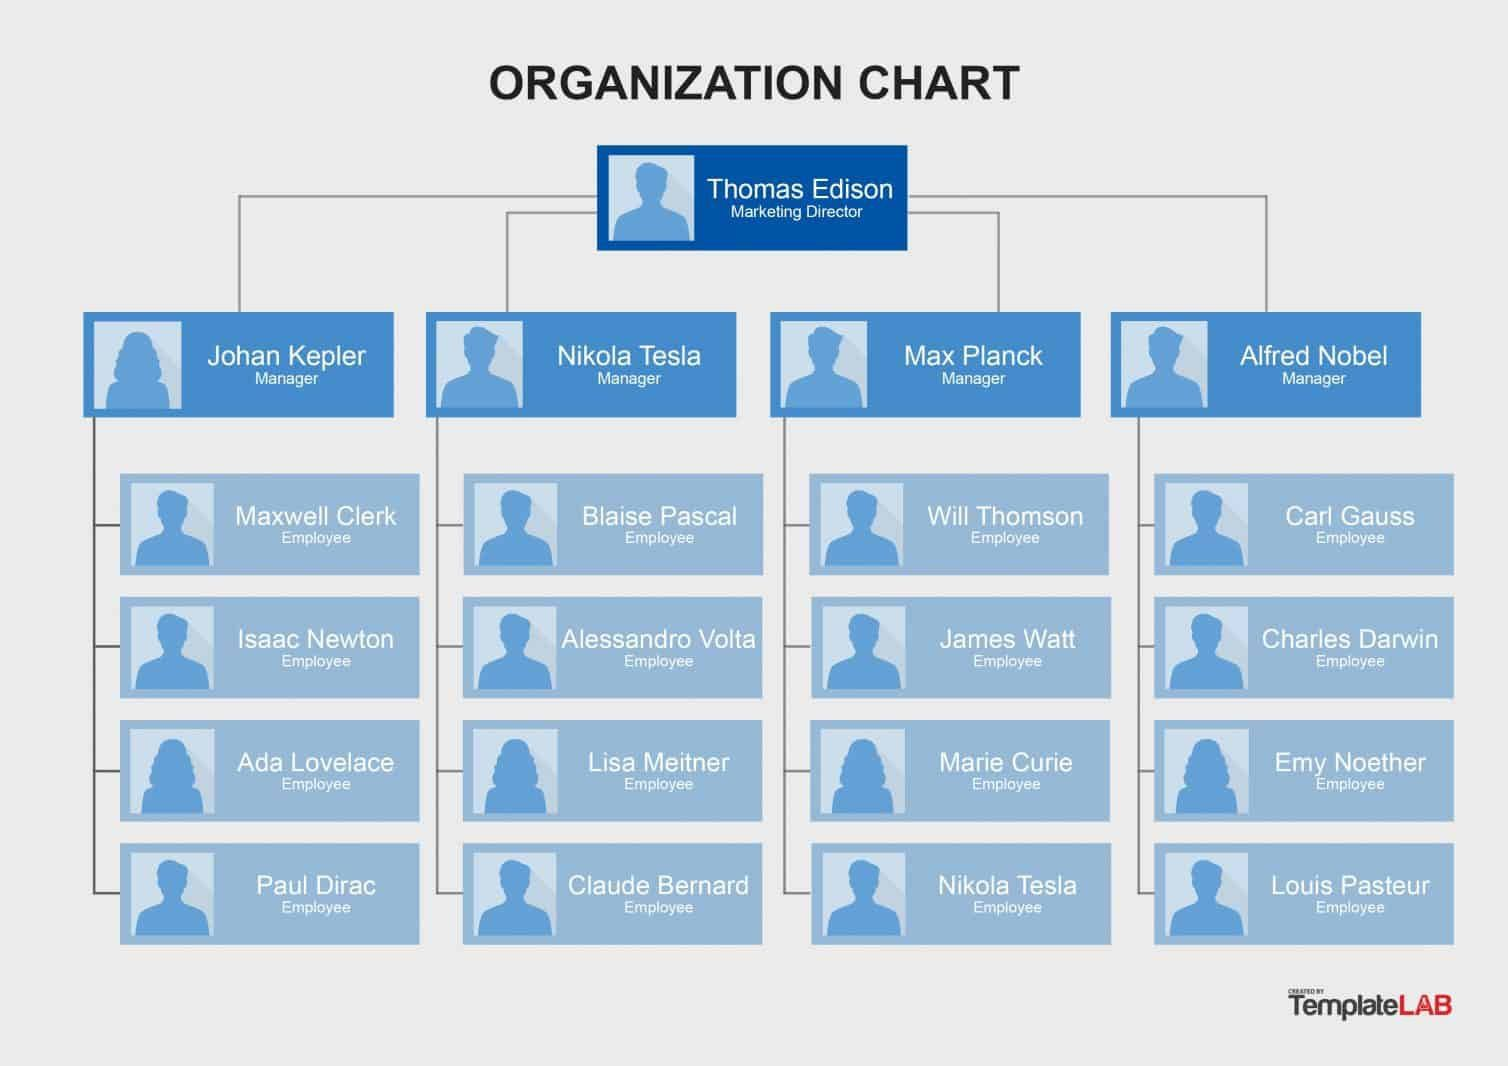 002 Beautiful Org Chart Template Microsoft Word 2010 Image Full